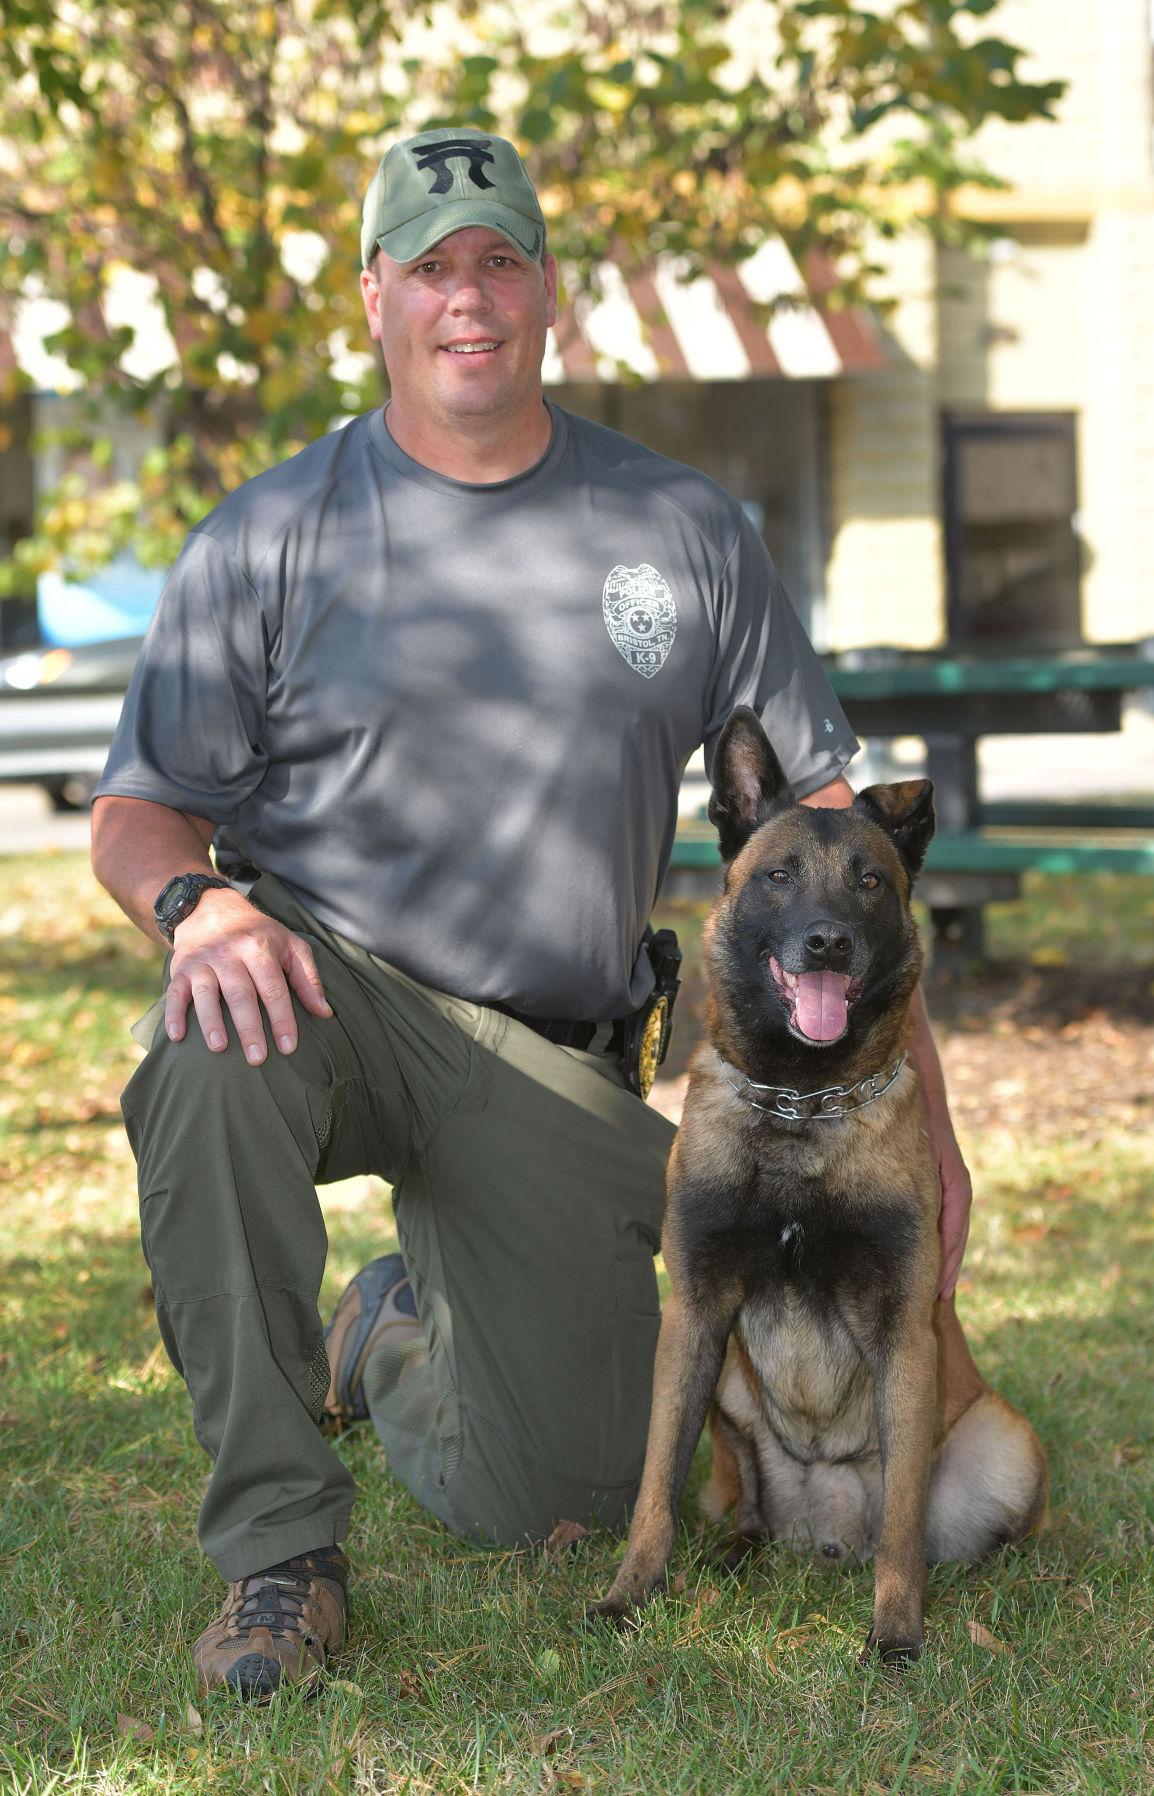 K-9 officers help law enforcement officials tackle crime